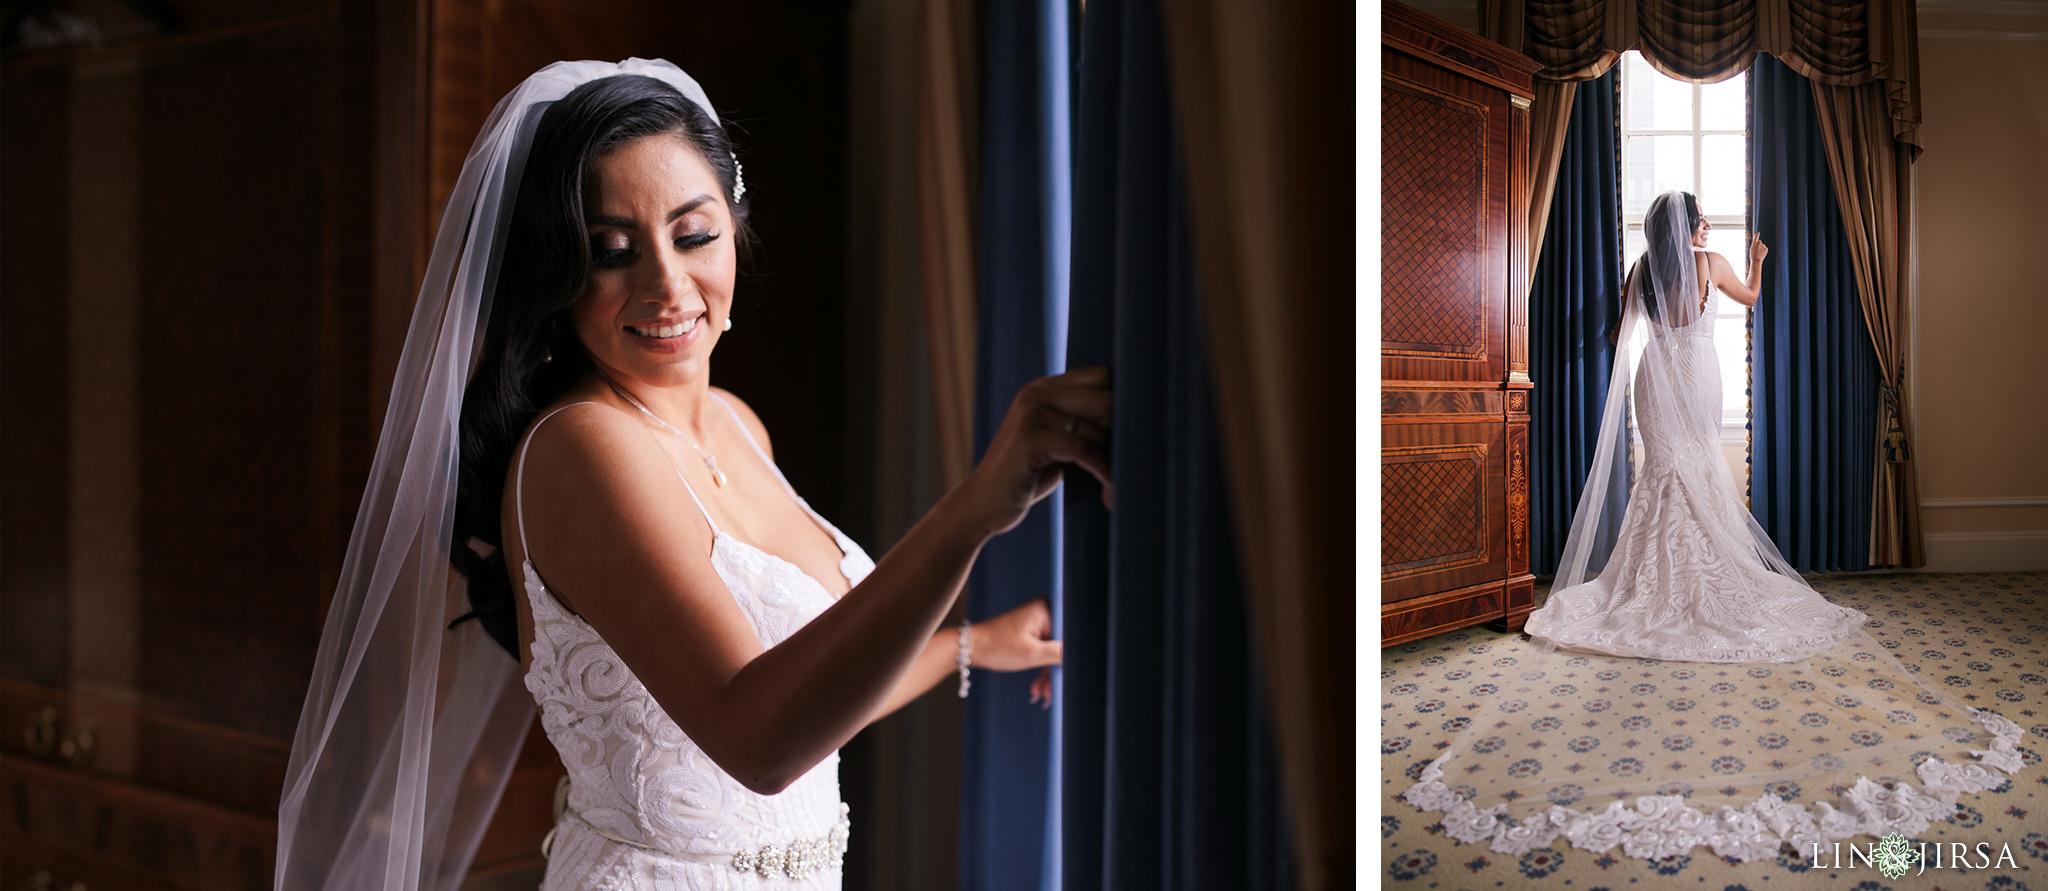 0027 Alexandria Ballroom Los Angeles County Wedding Photography